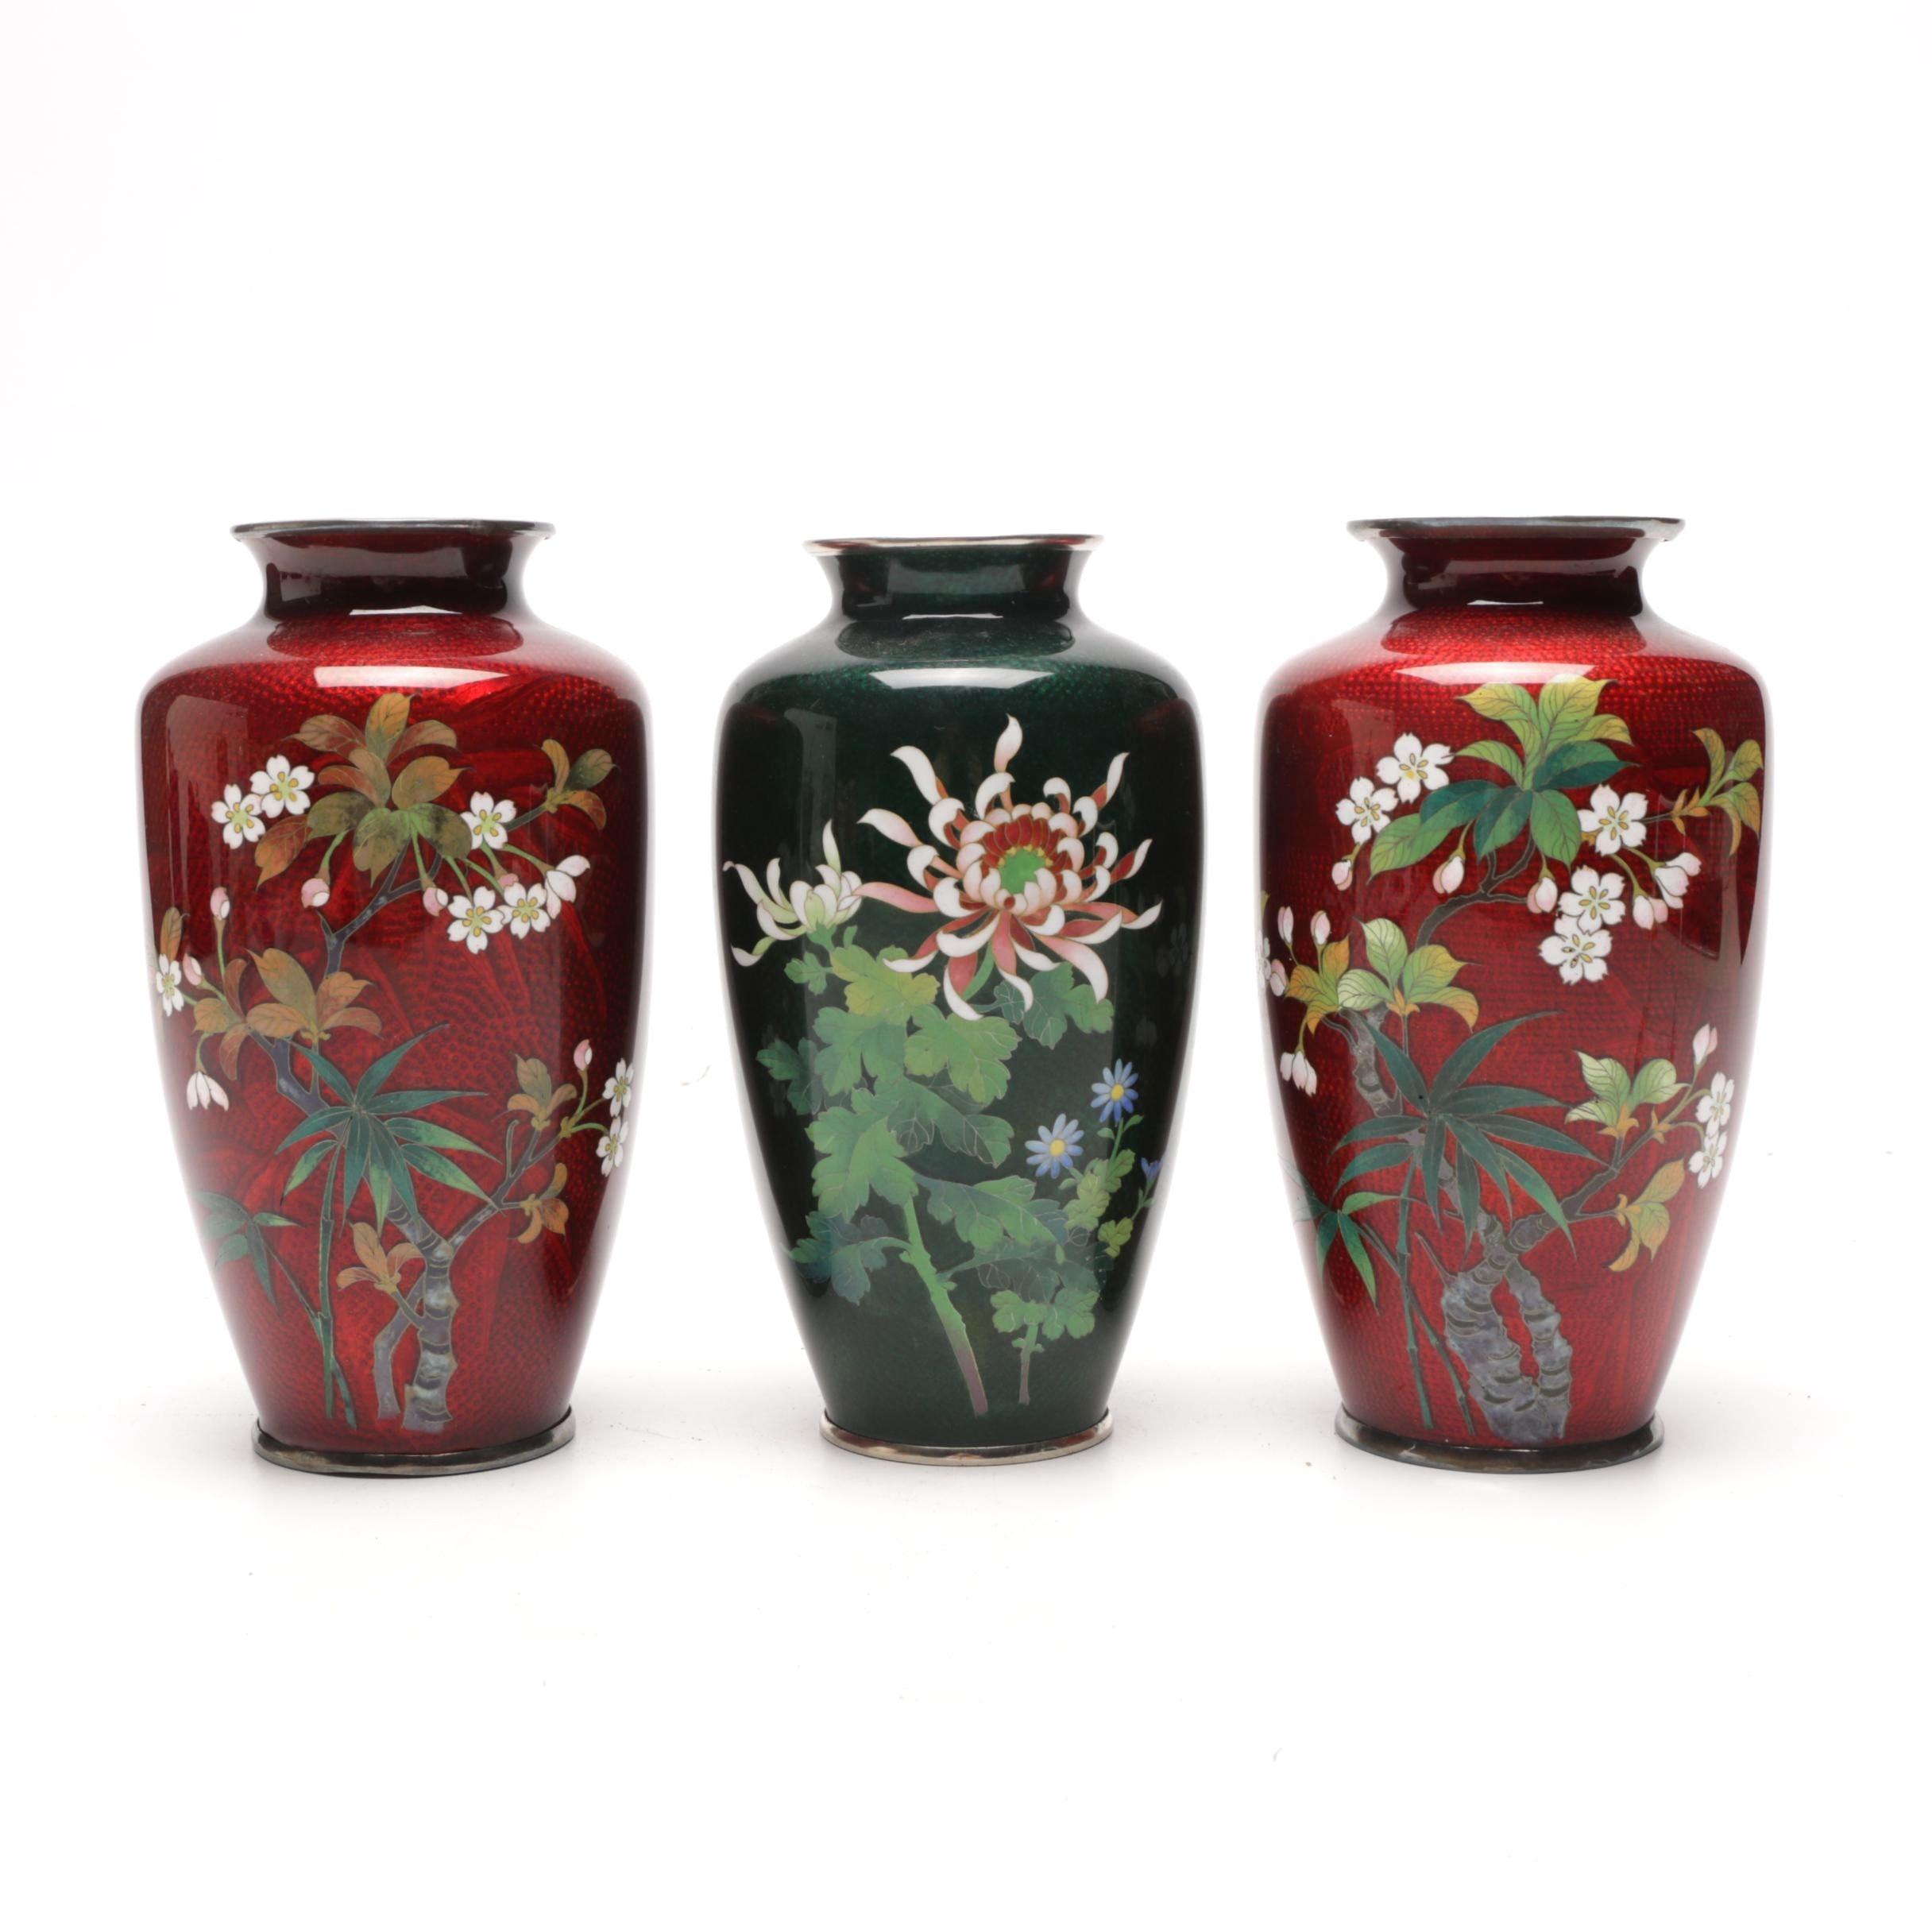 Japanese Cloisonné Vases, Mid-20th Century